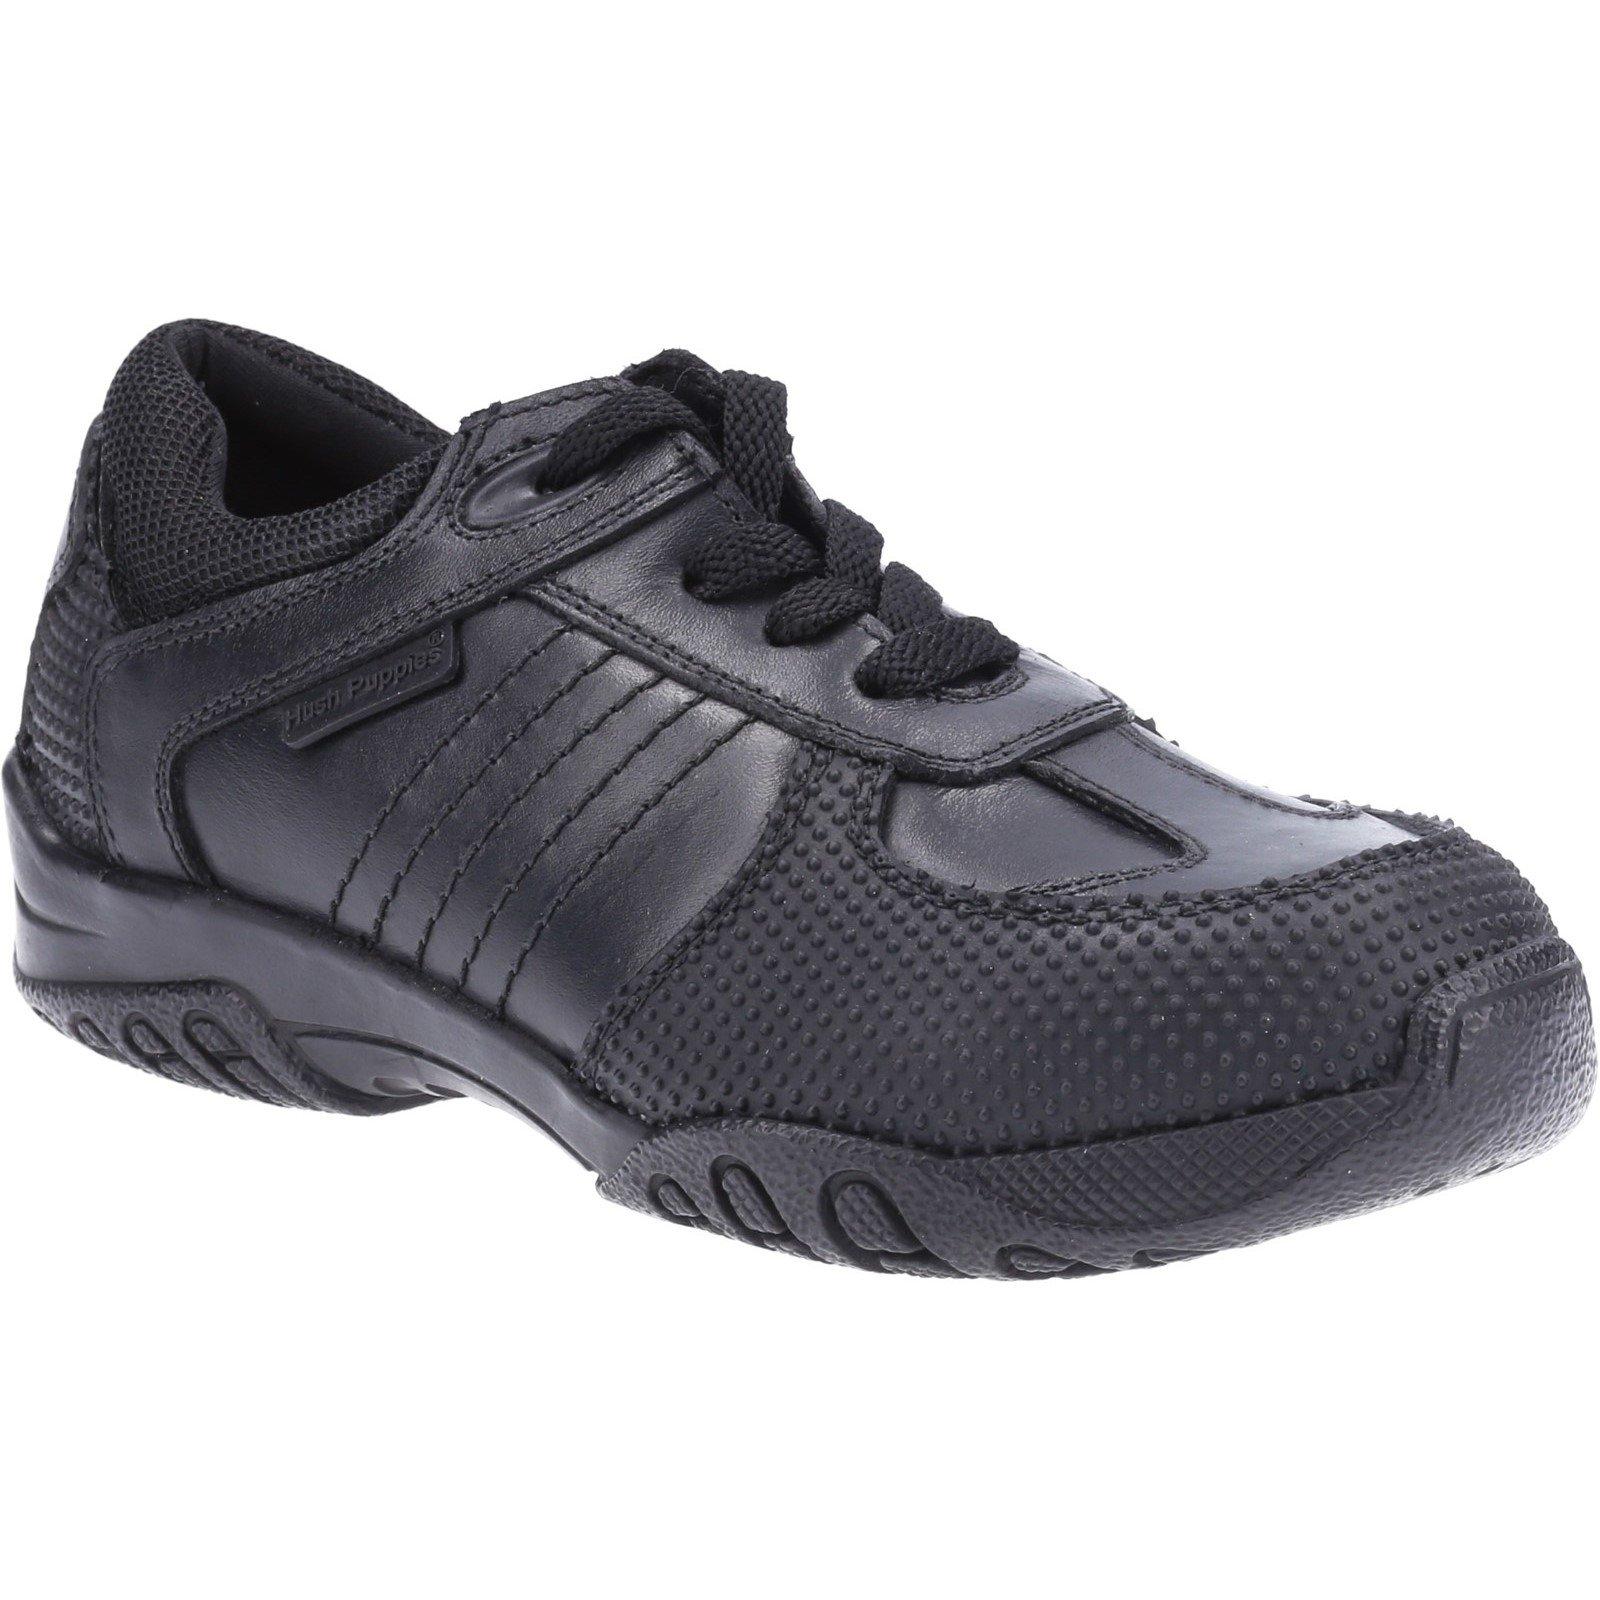 Hush Puppies Kid's Jezza Junior School Shoe Black 32587 - Black 12.5